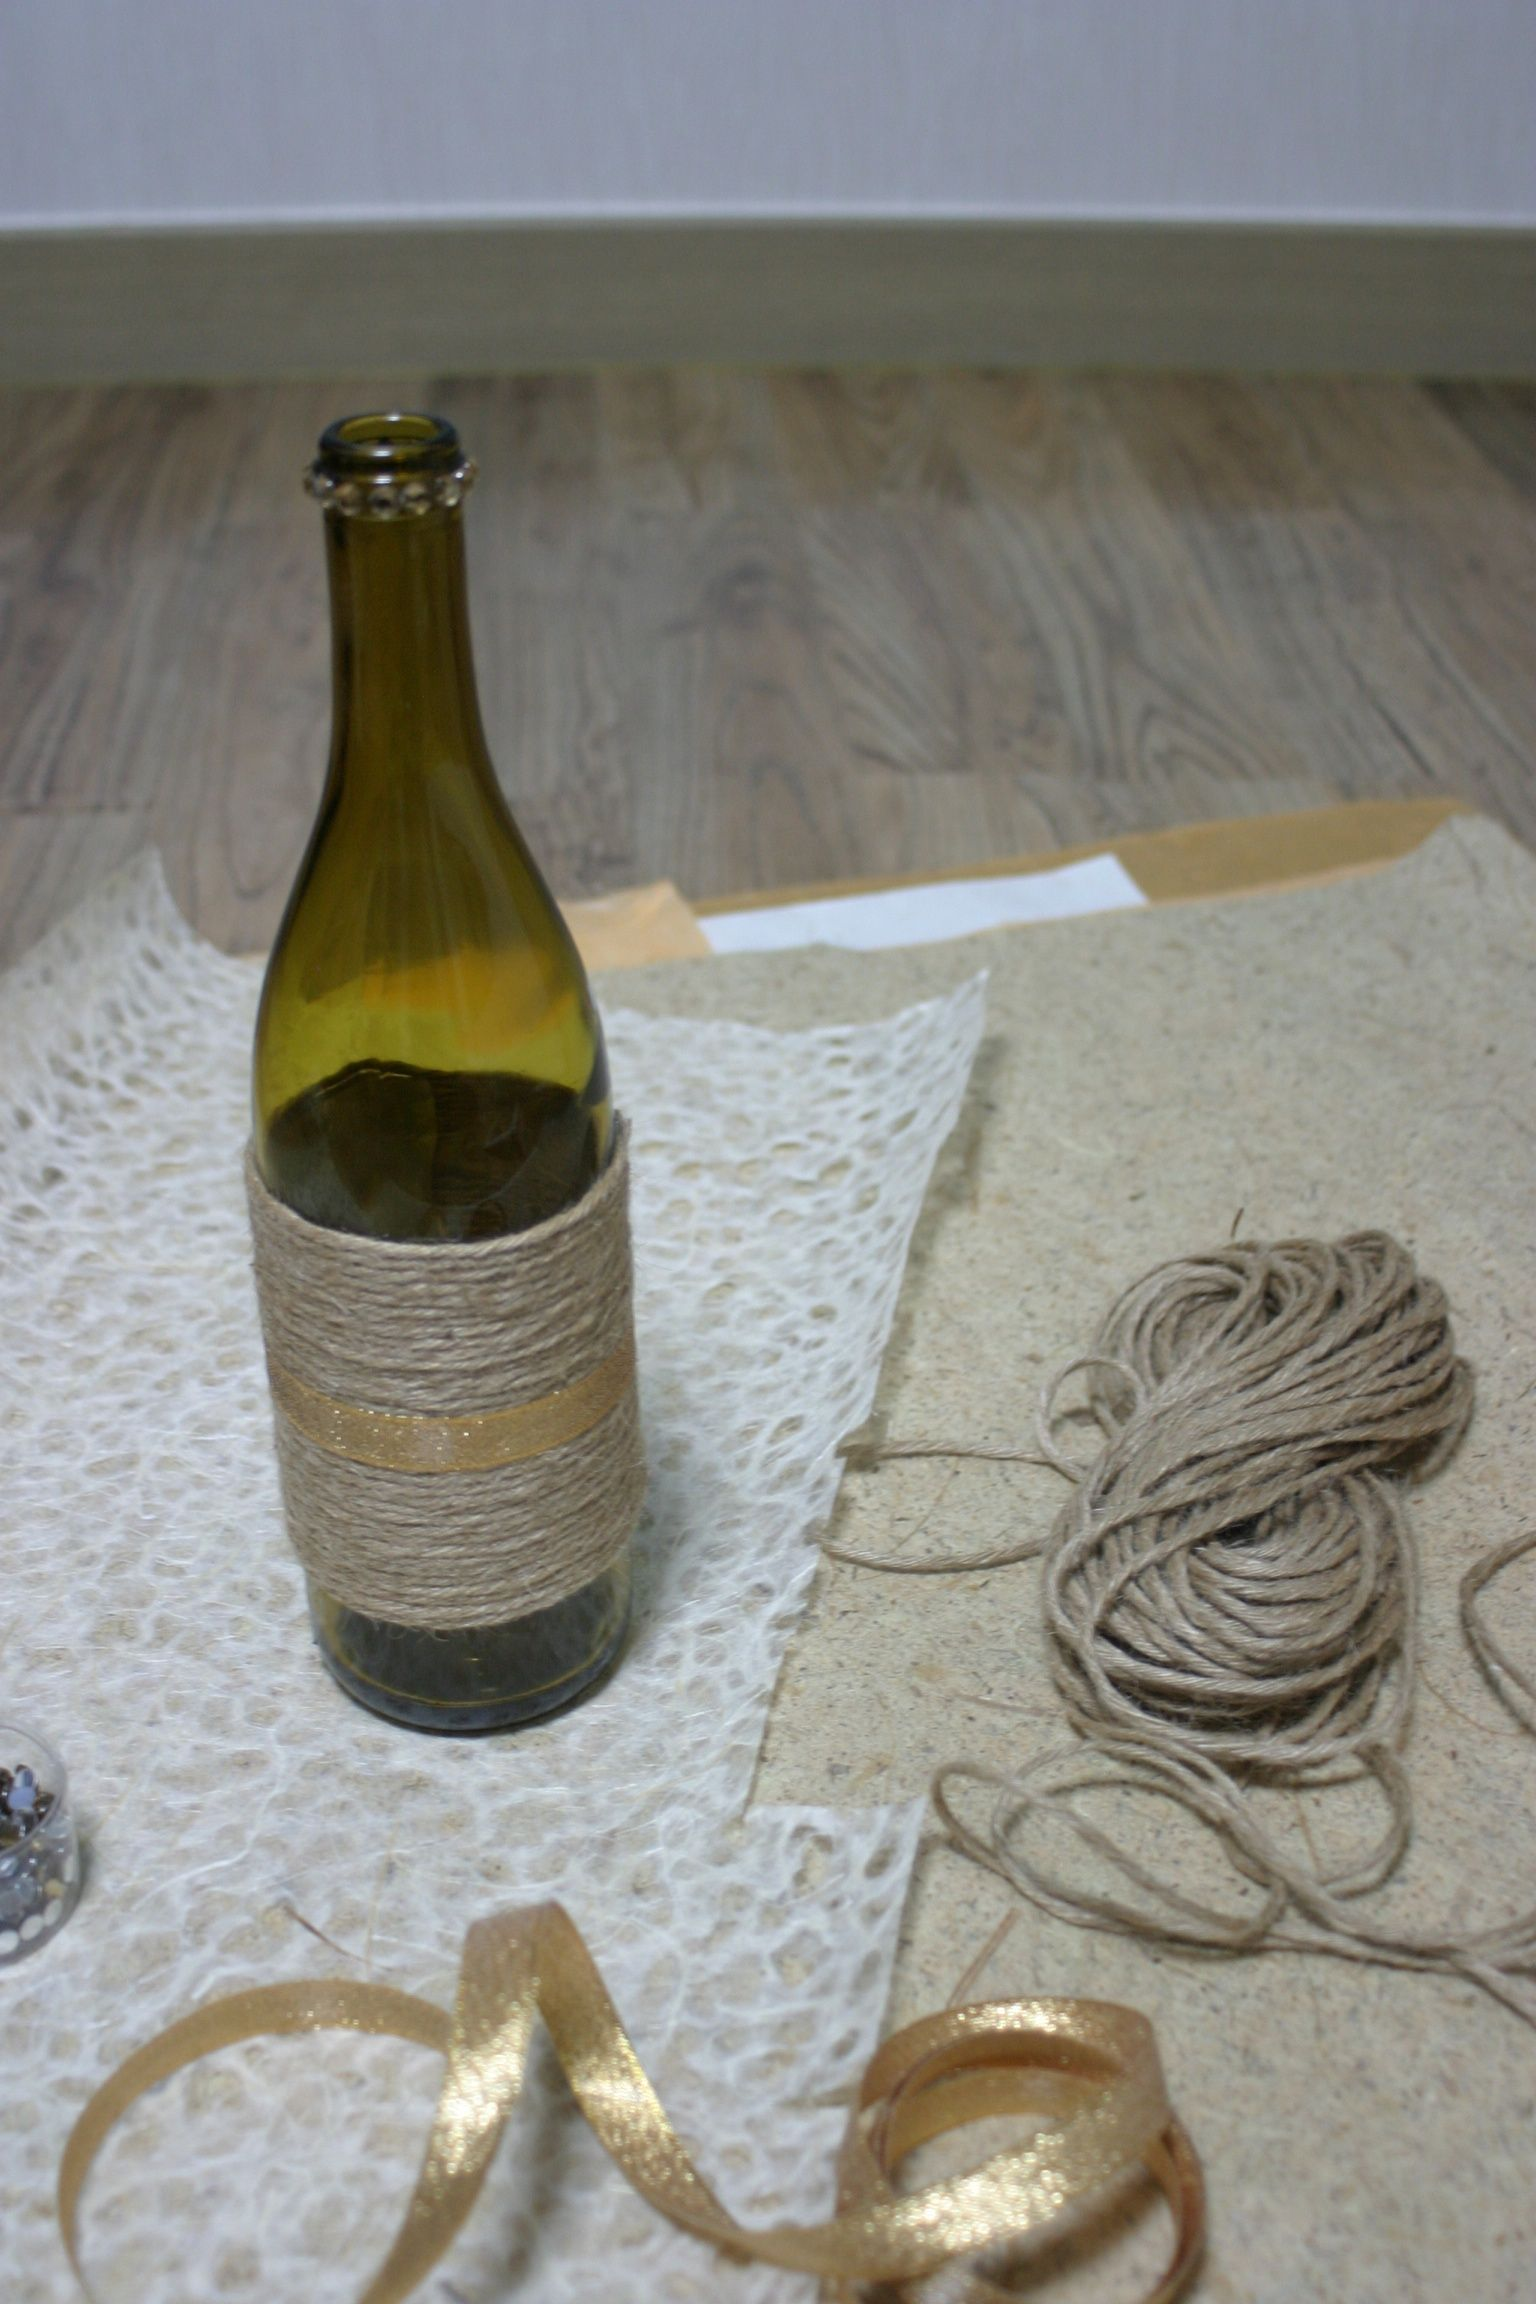 Diy wine bottle vase creative diy ideas pinterest bottle wine diy wine bottle vase floridaeventfo Gallery